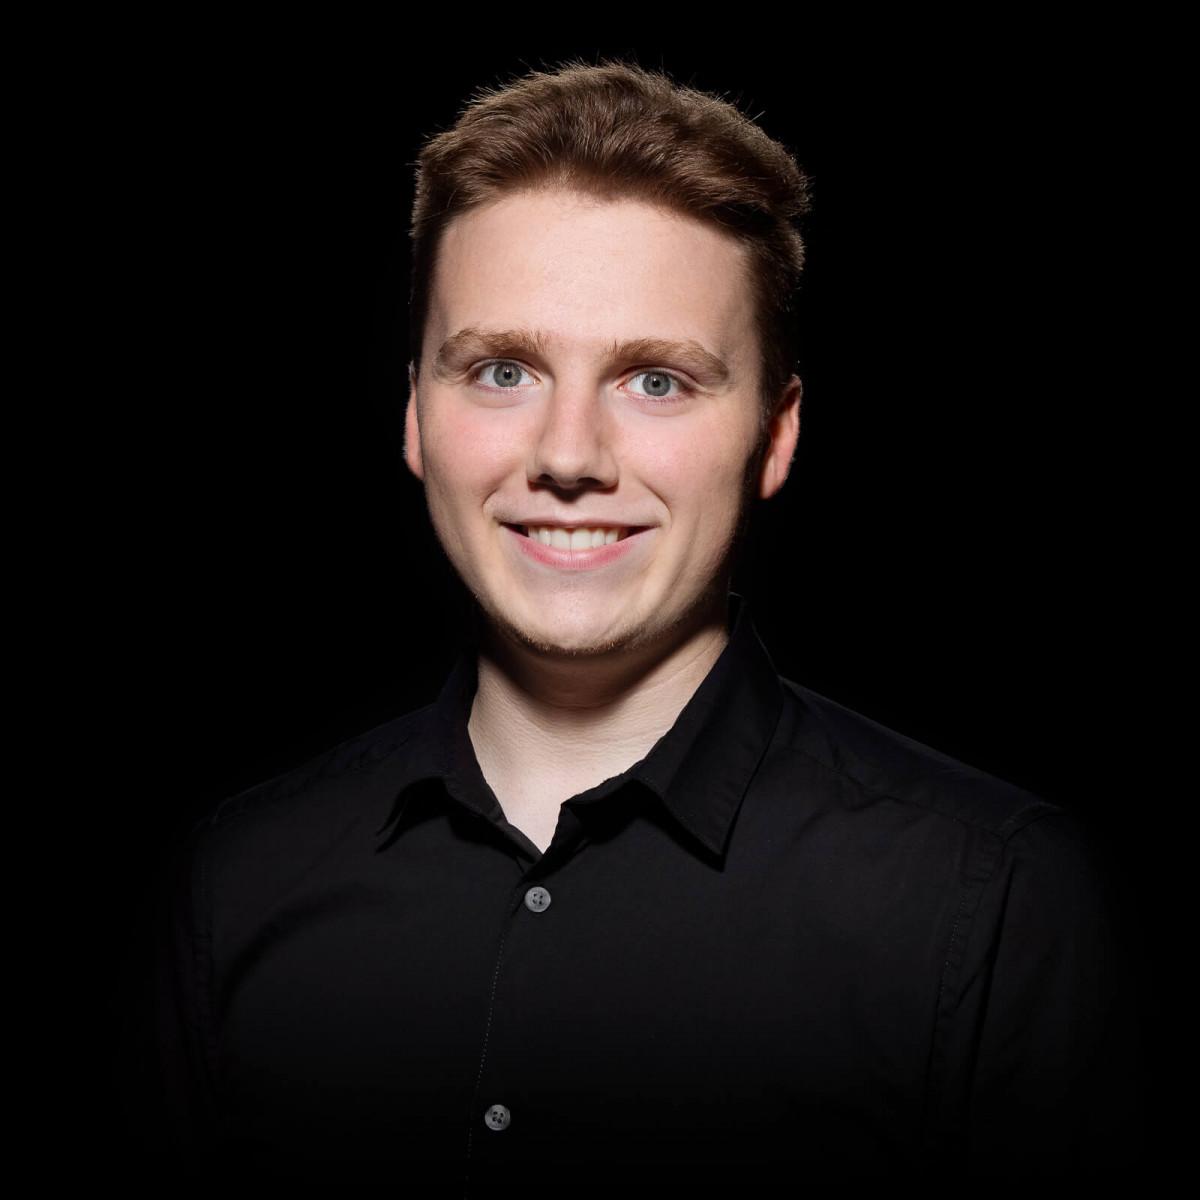 Jannik Kaspari – webentwicklung / content management